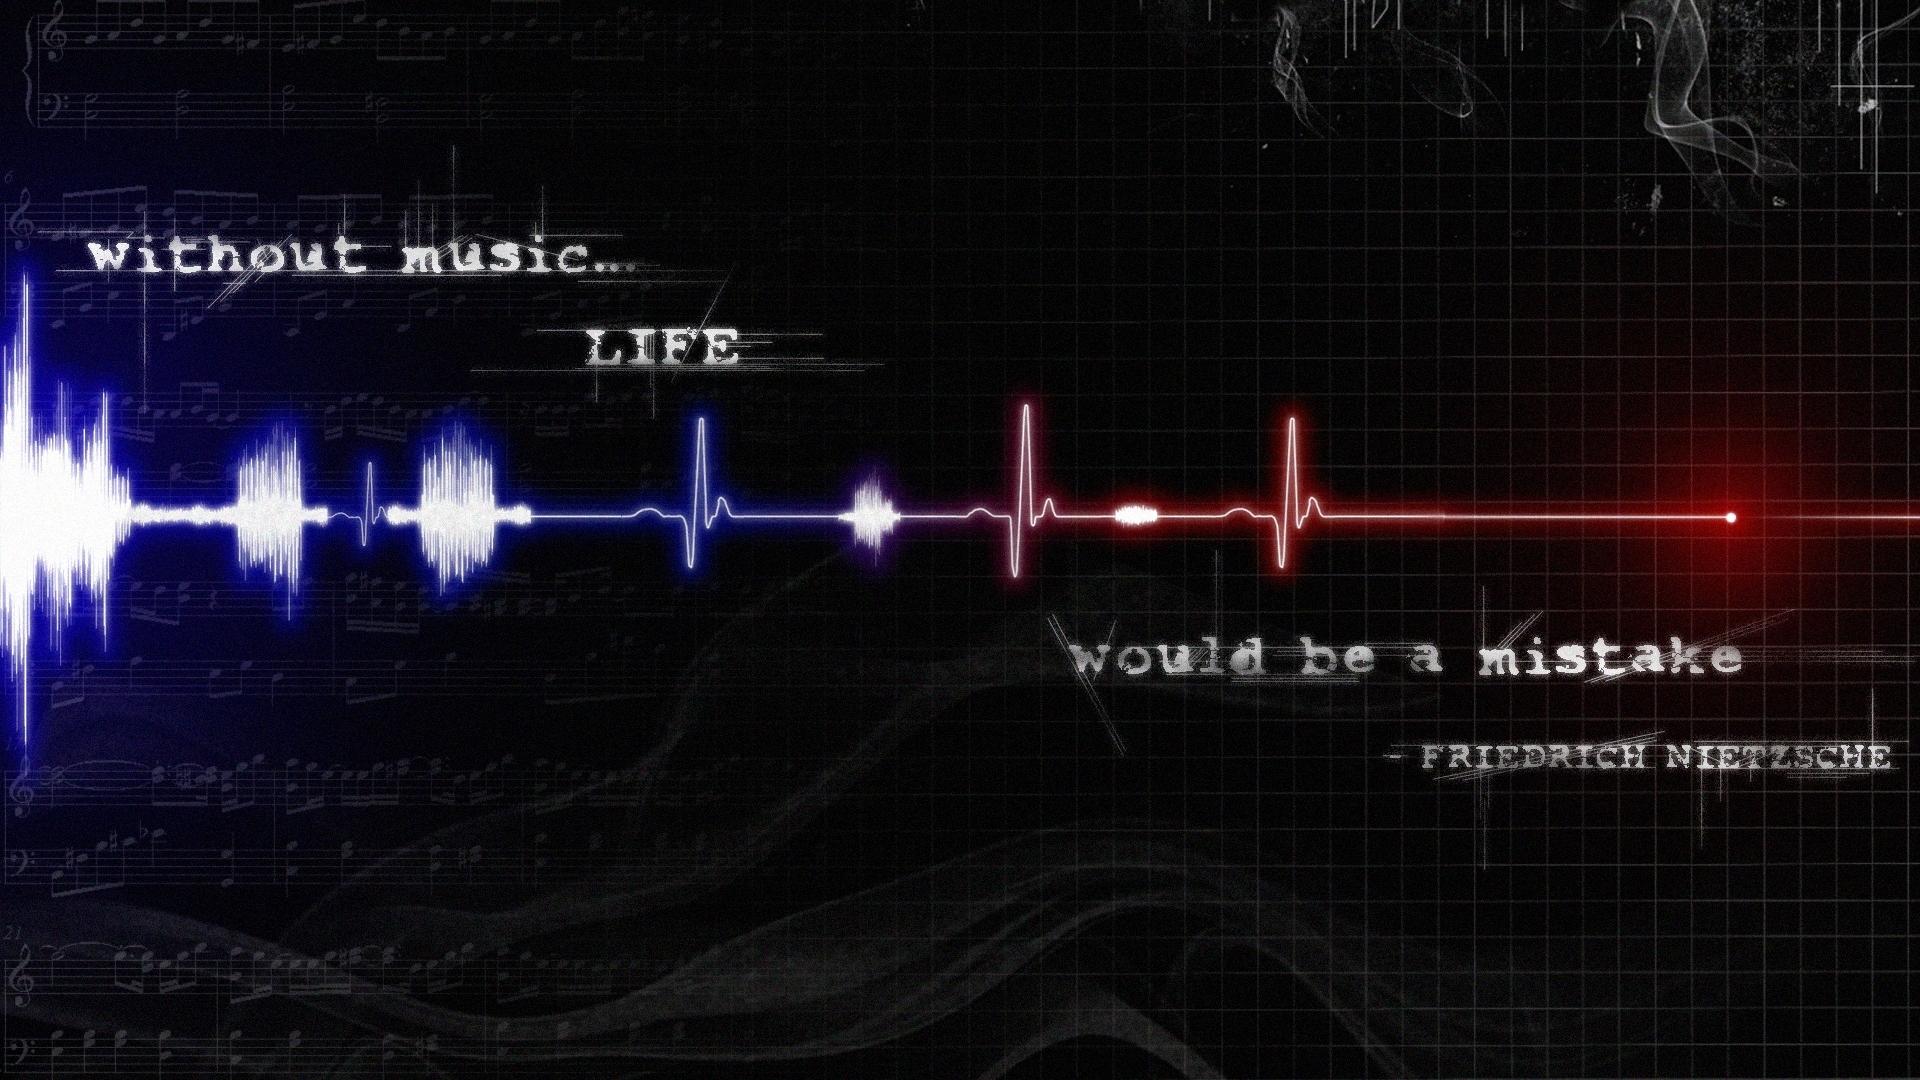 download music life wallpaper 1920x1080 | wallpoper #257239